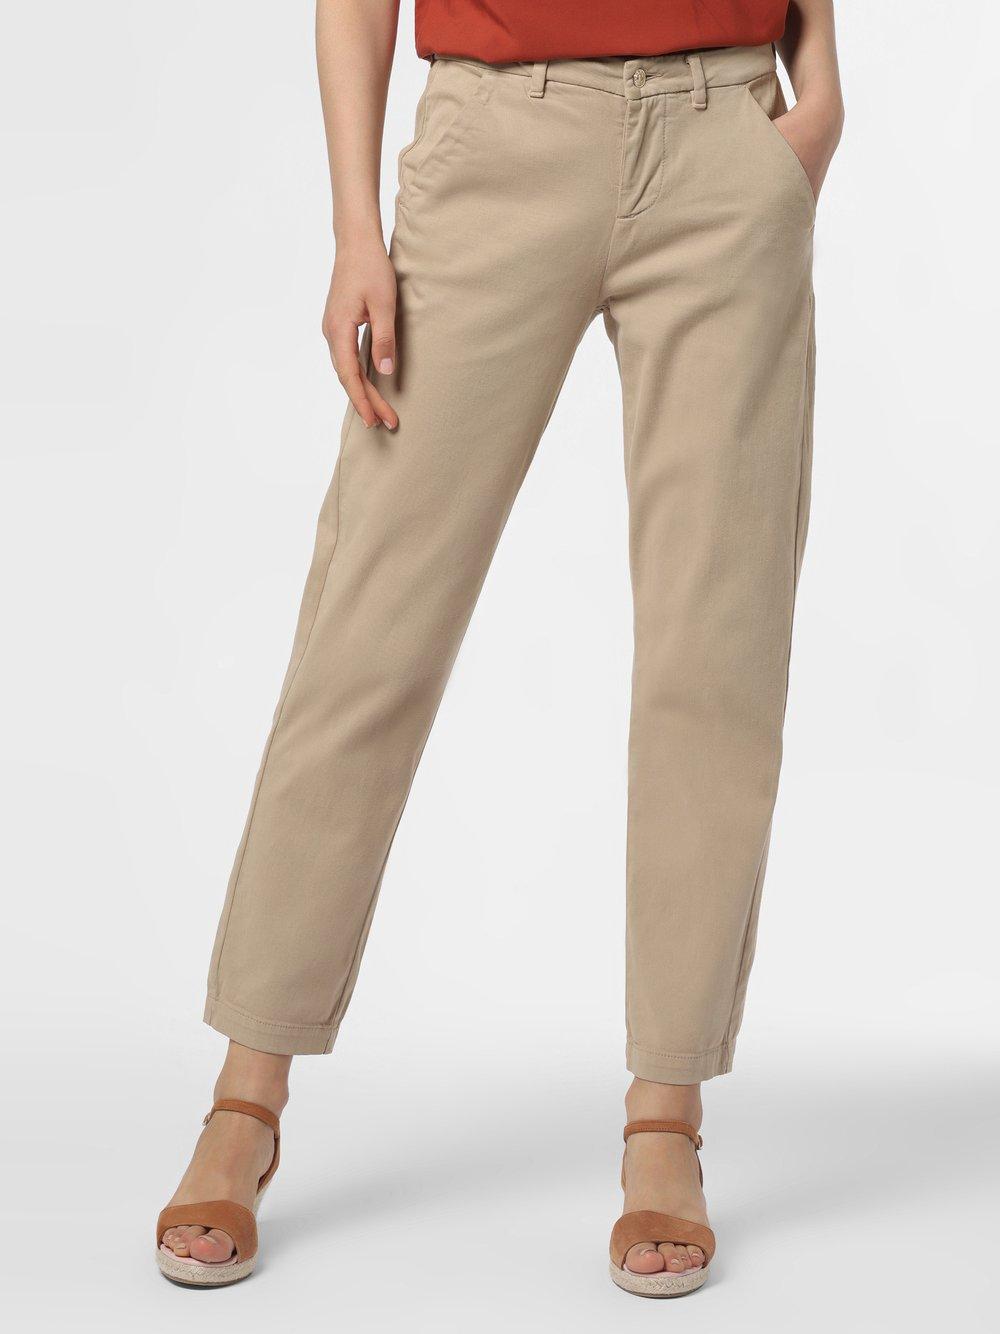 7 For All Mankind – Spodnie damskie – Chino, beżowy Van Graaf 478167-0001-00270